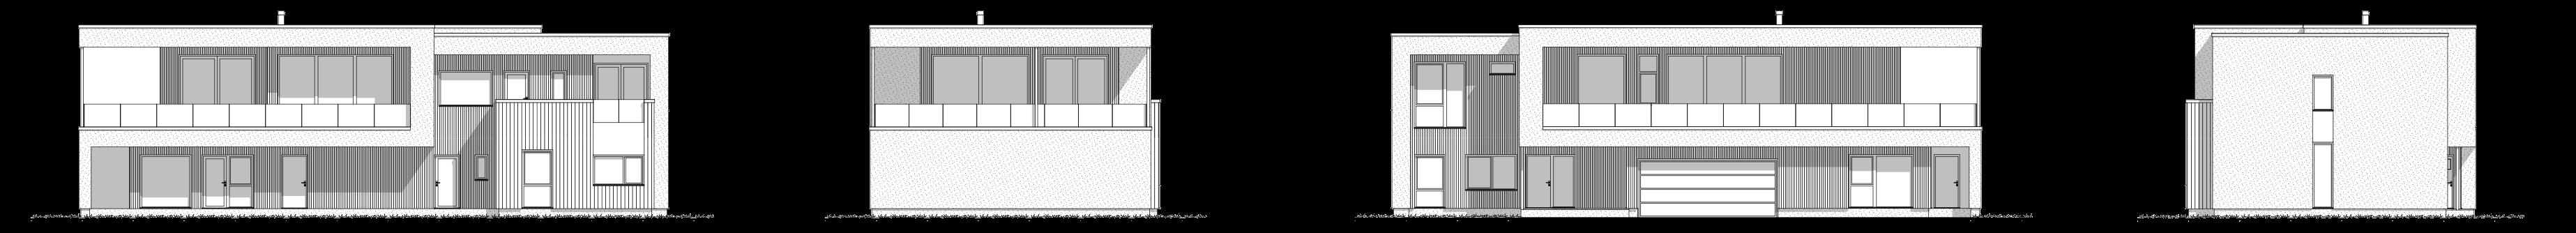 Aksla fasade